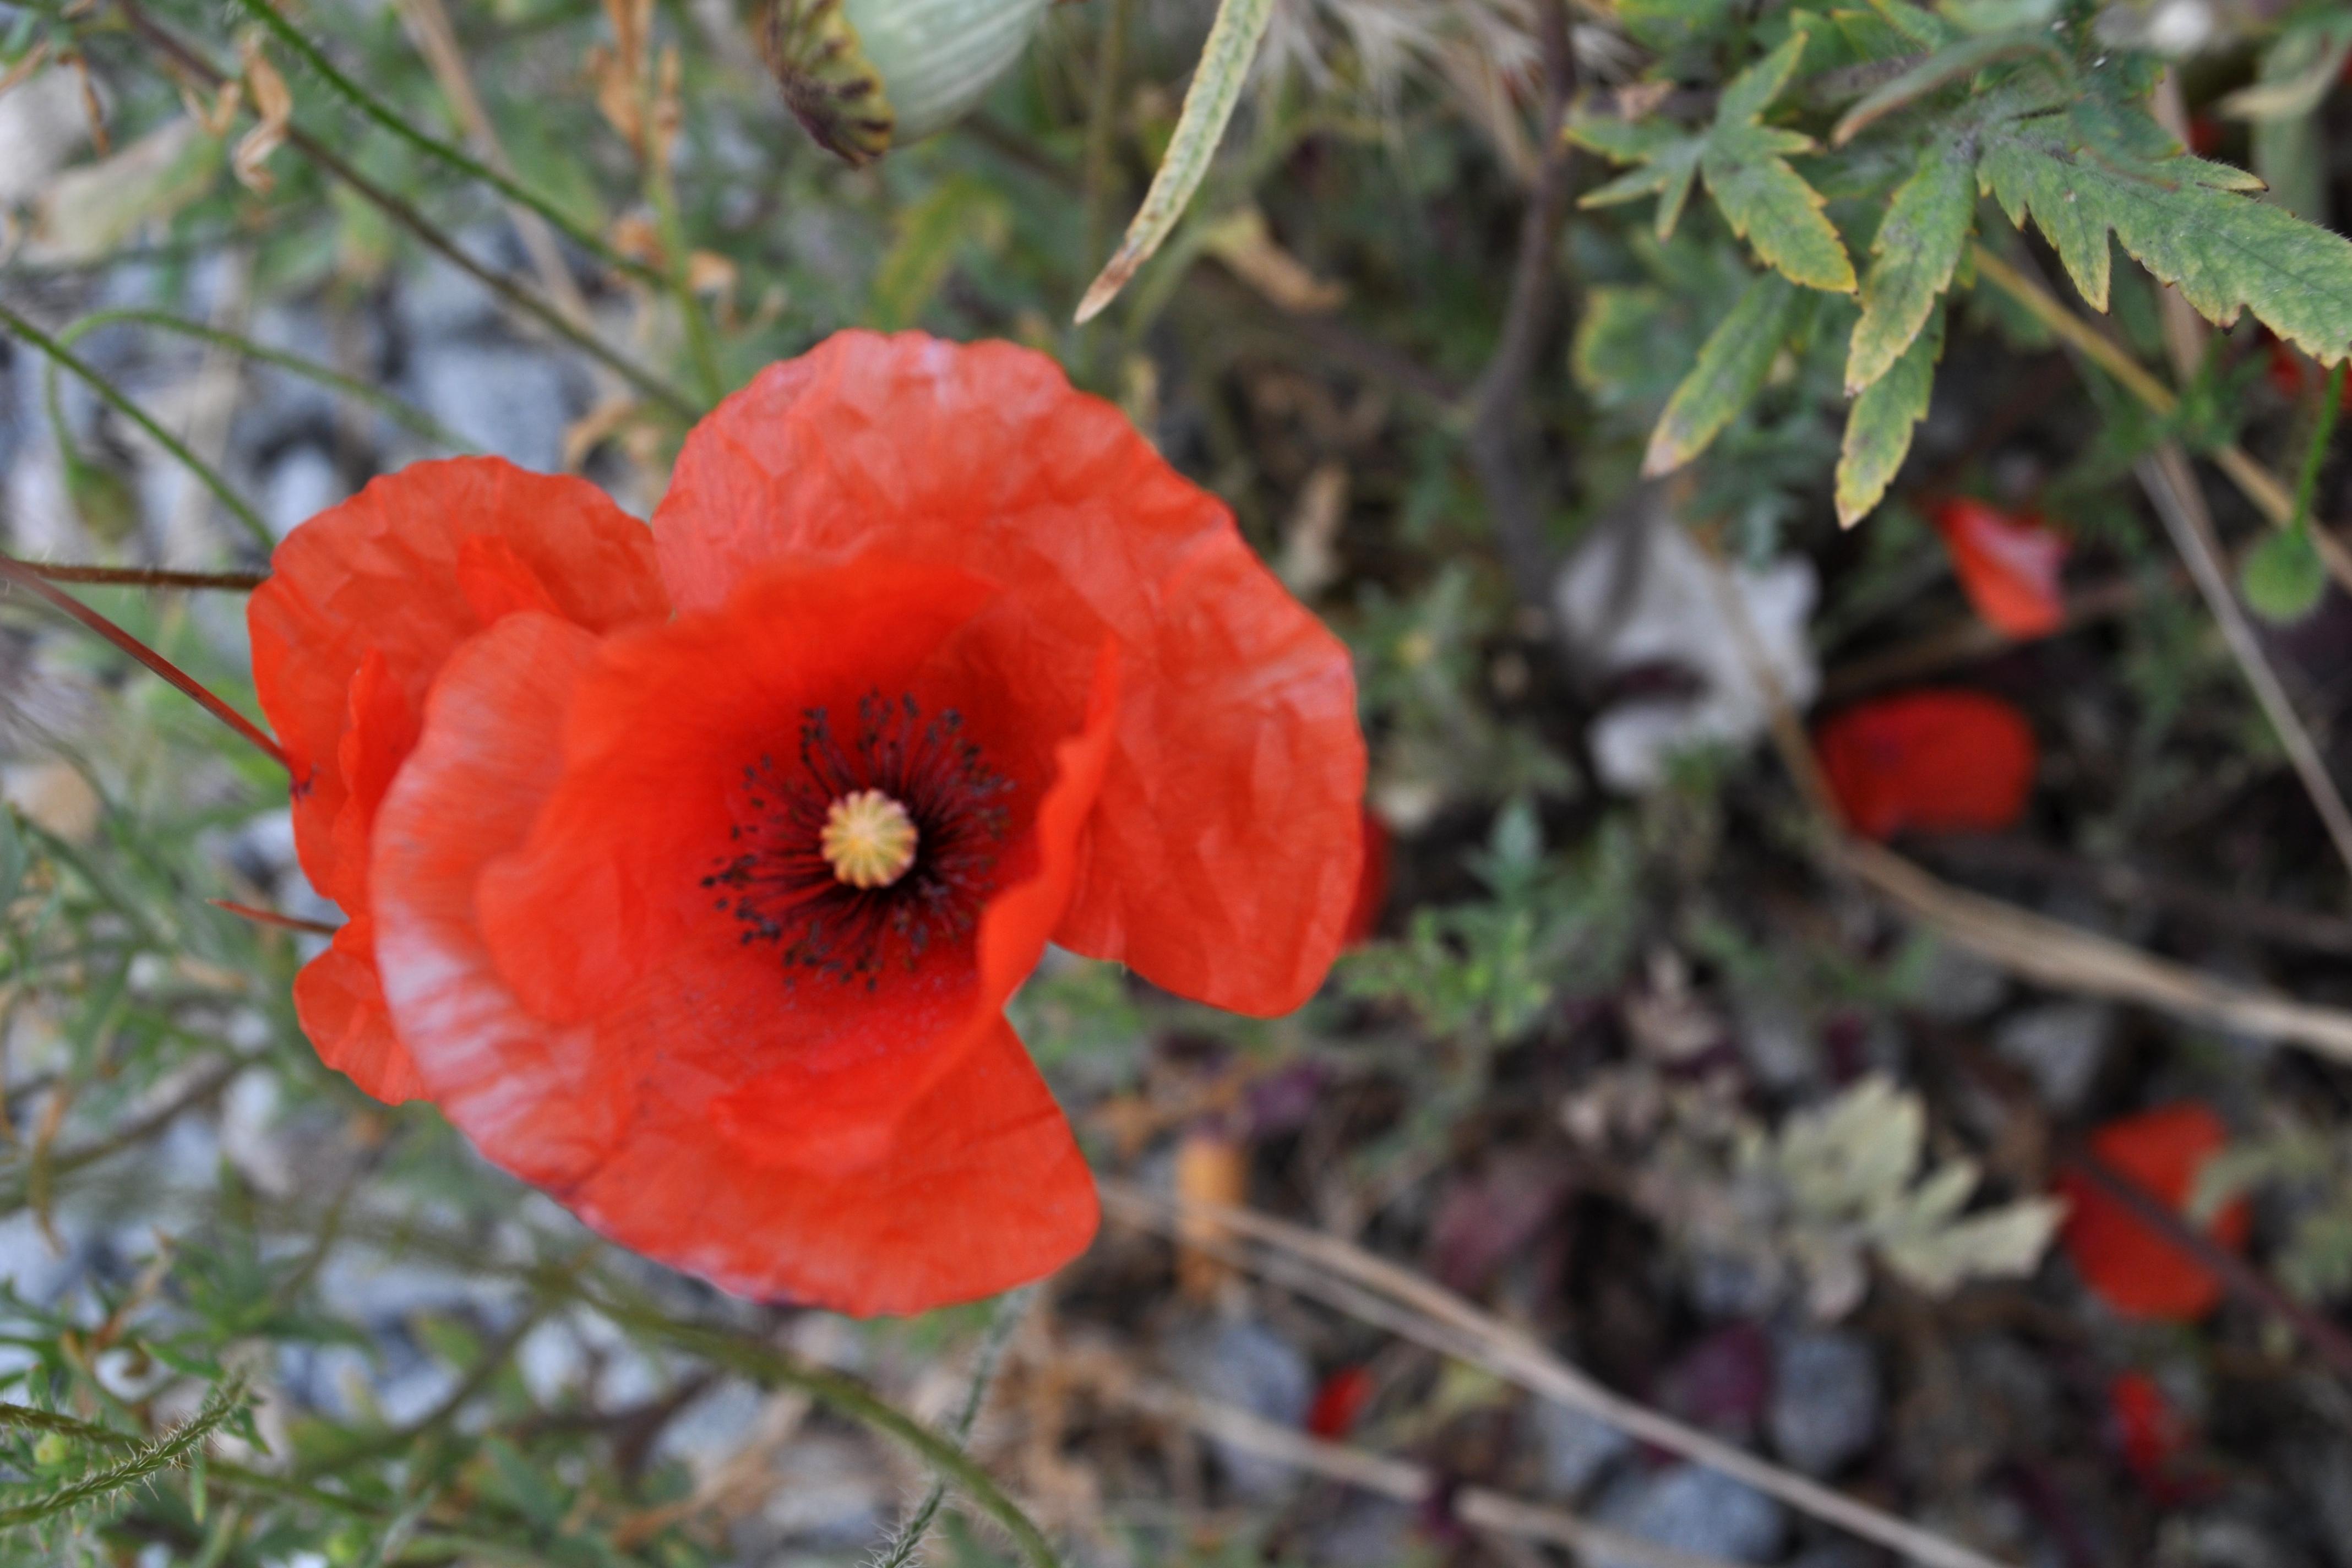 Spanish Poppyseed Flower